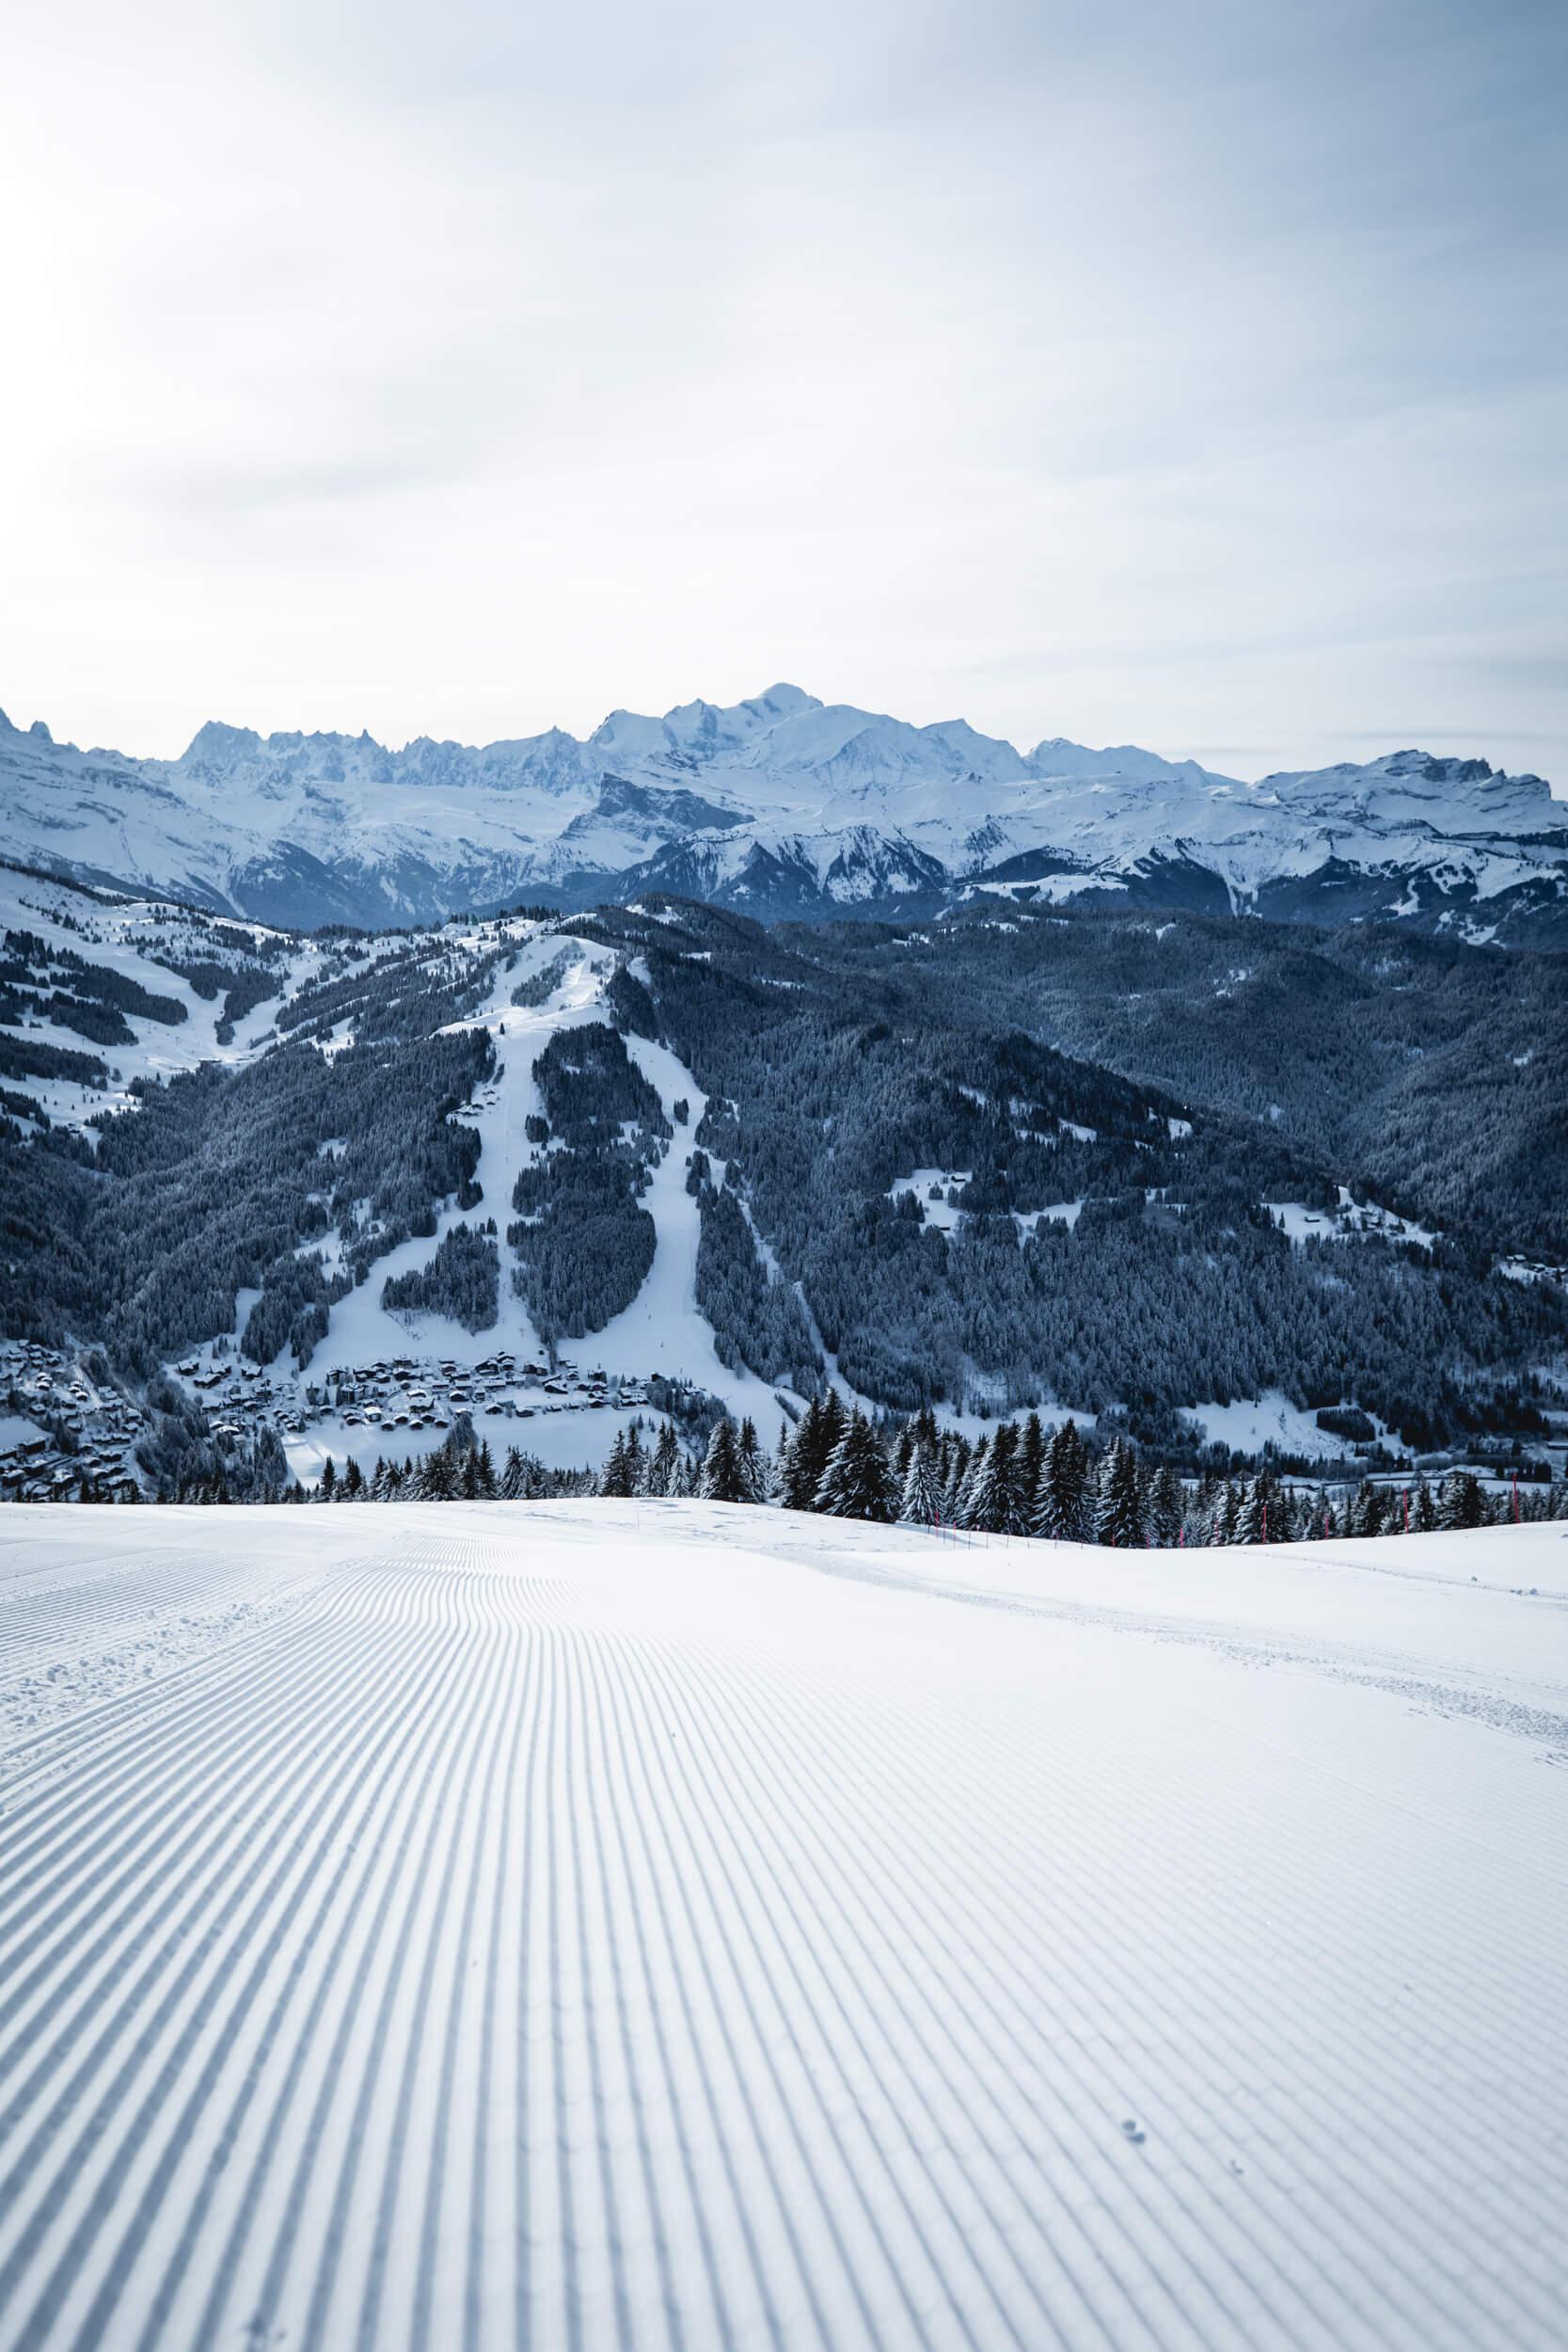 domaine skiable les Gets